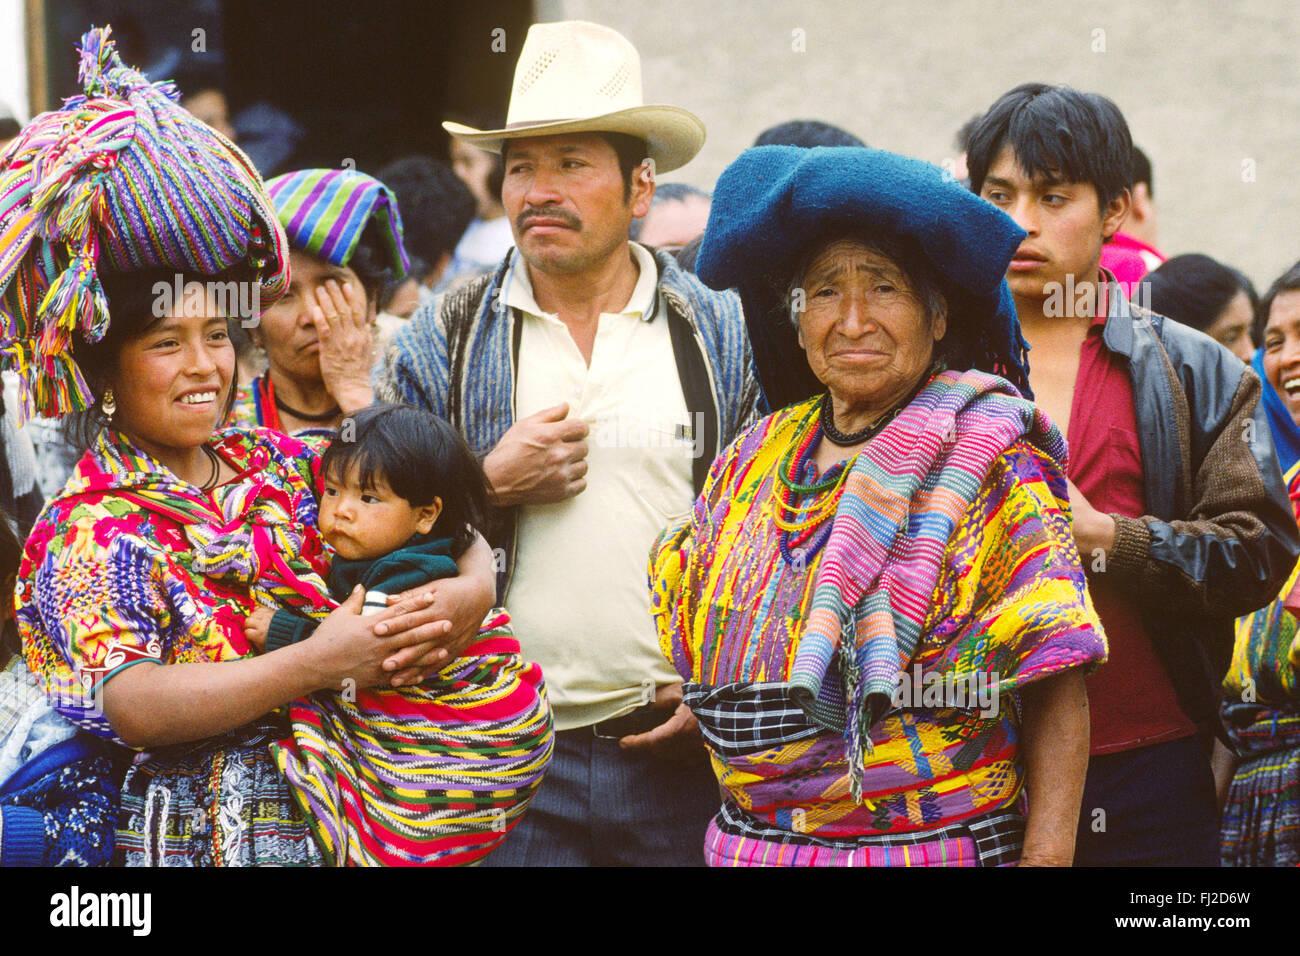 INDIGENOUS PEOPLE in TRADITIONAL DRESS watch LA MERCED CHURCH GOOD FRIDAY PARADE - ANTIGUA, GUATAMALA - Stock Image